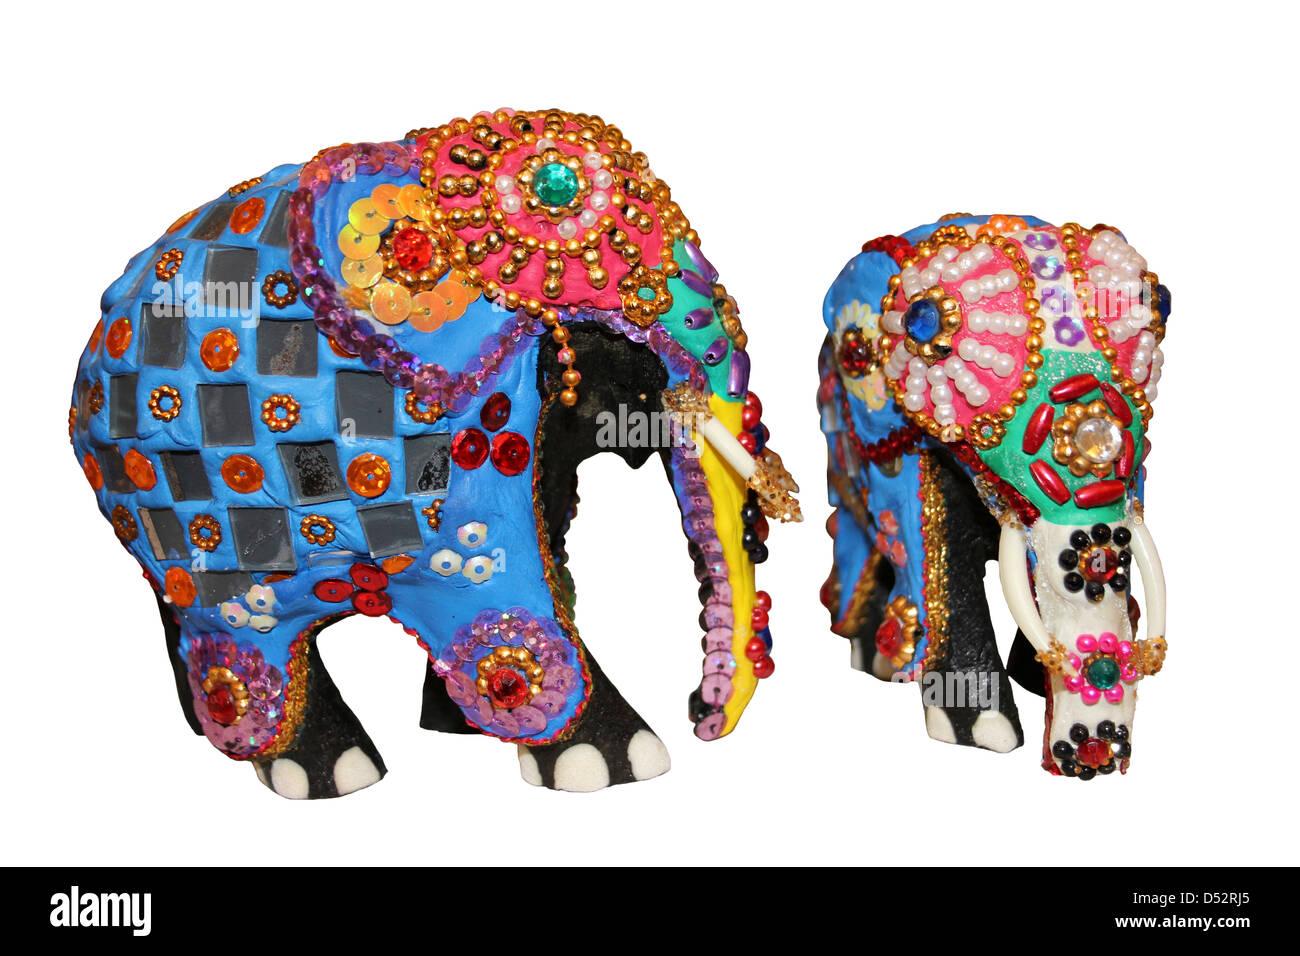 Internationale Antiq. & Kunst Wandbehand Souvenir Thailand Elefanten Pailletten Stickerei